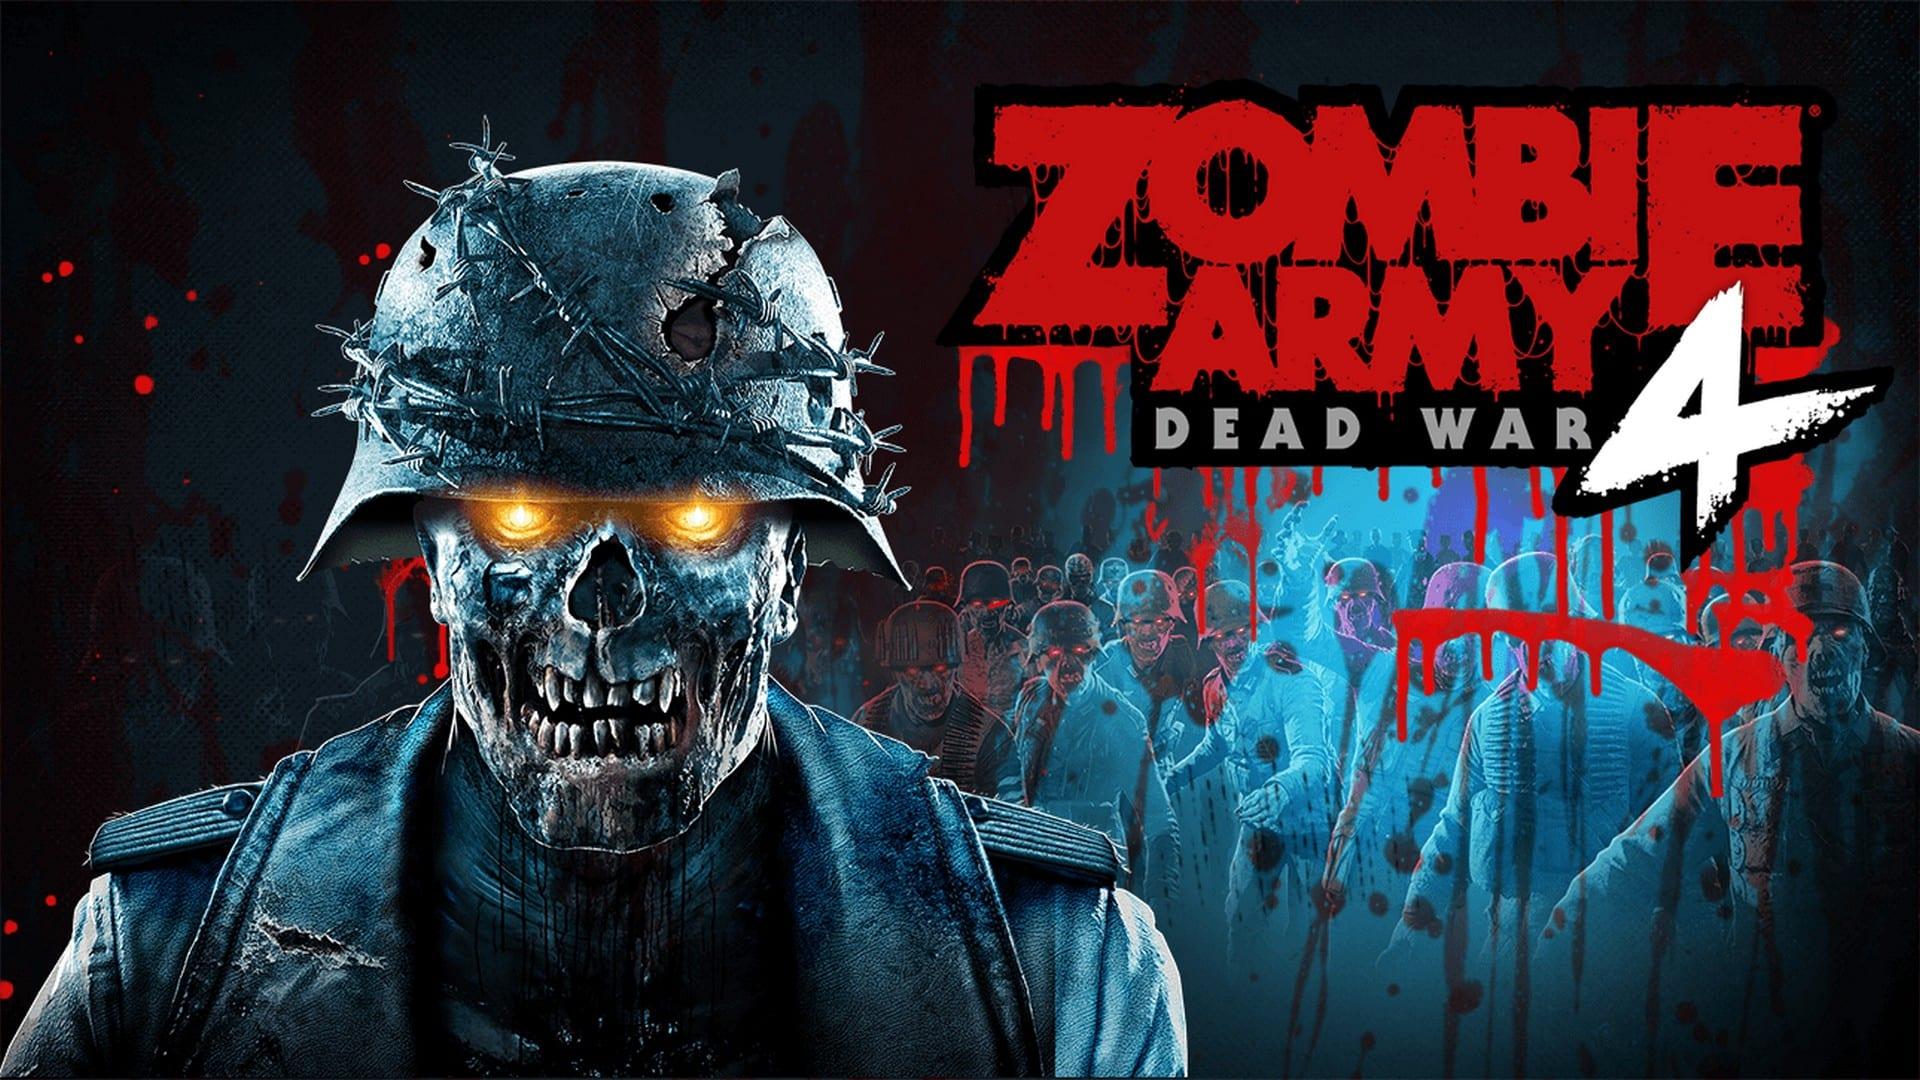 Zombie army 4 dead war sudorealm image ps plus ps4